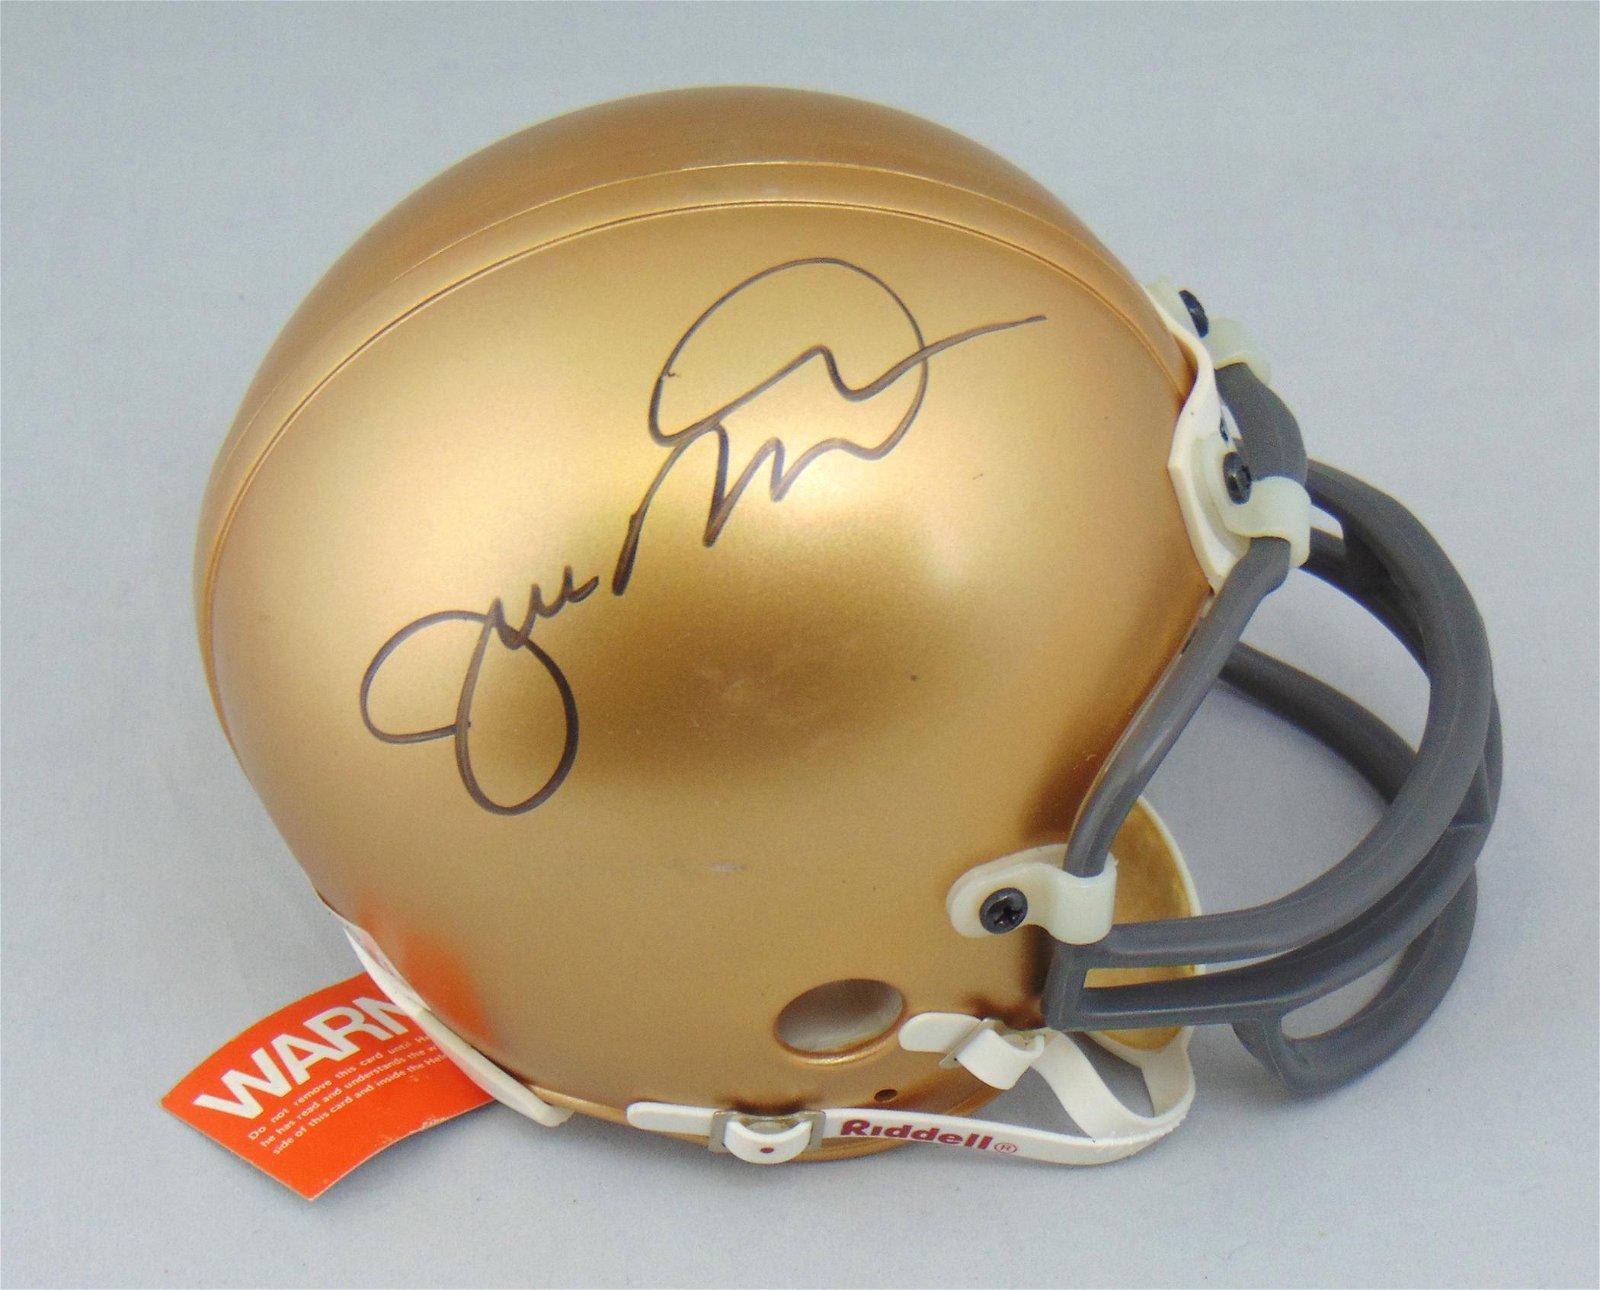 Joe Montana mini helmet